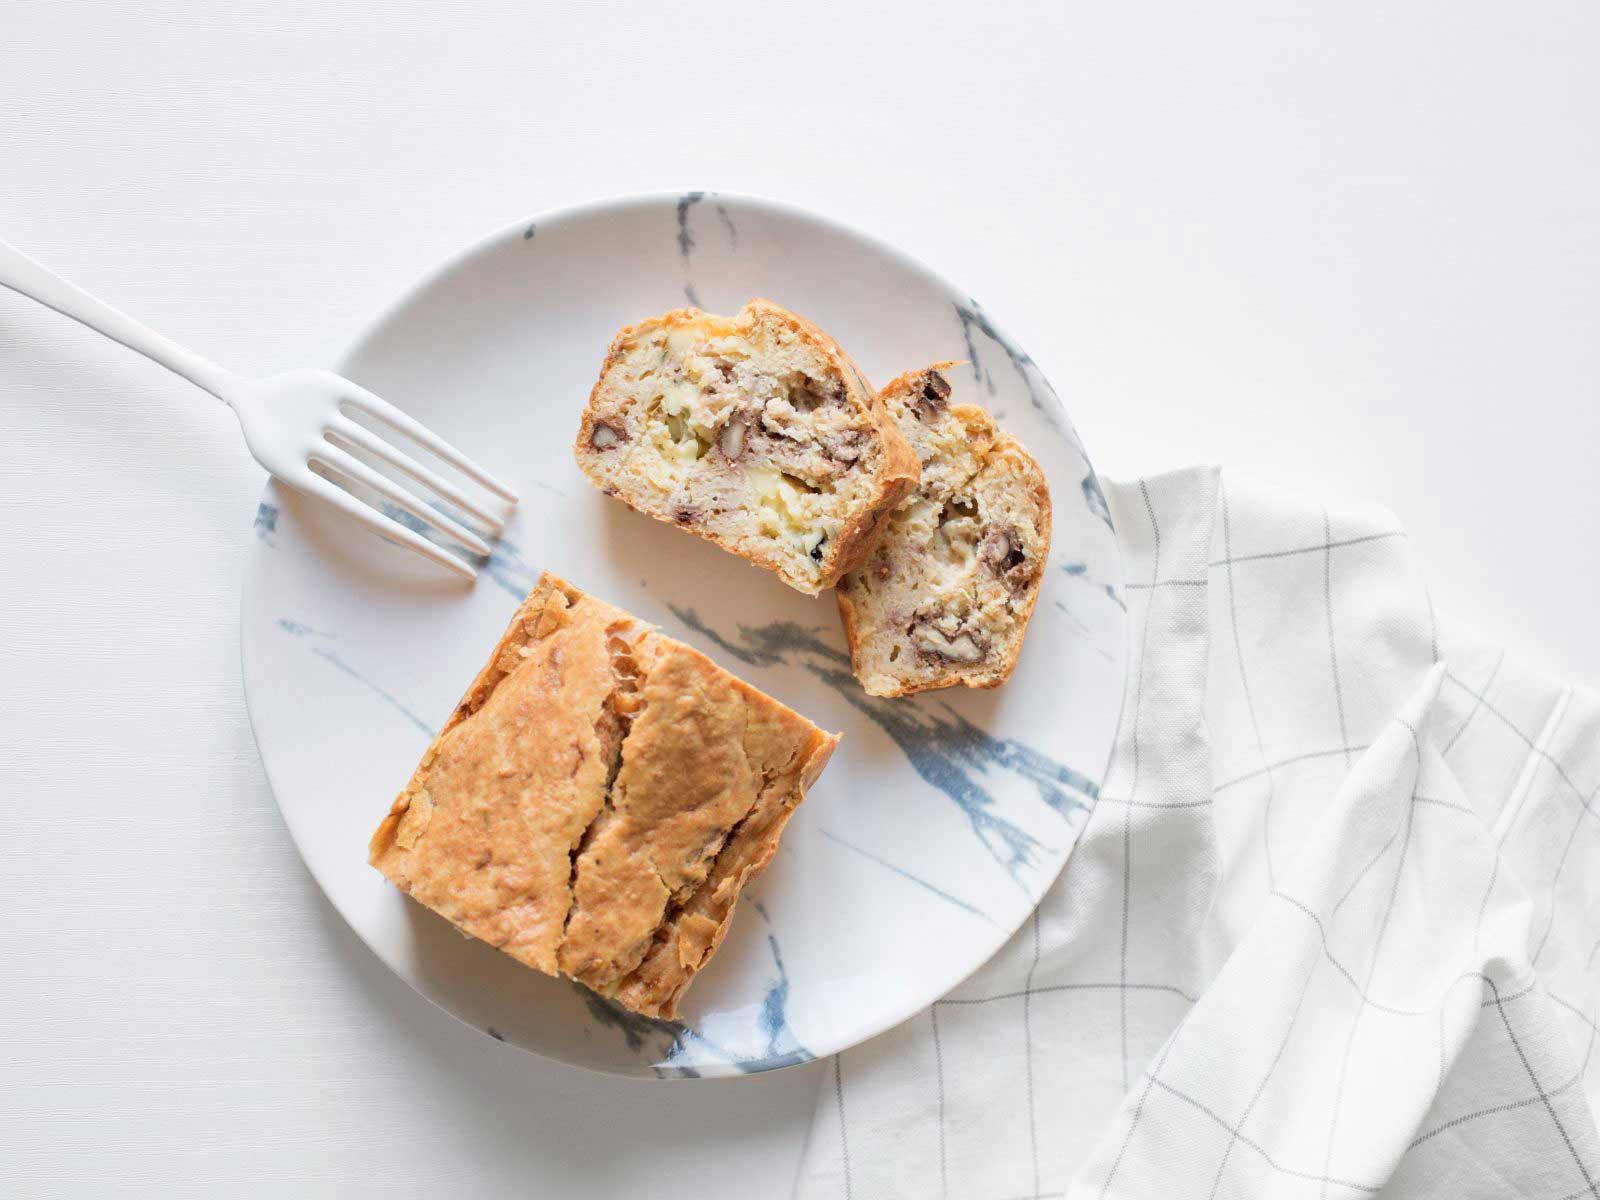 Visu Page bienfaits du sans gluten